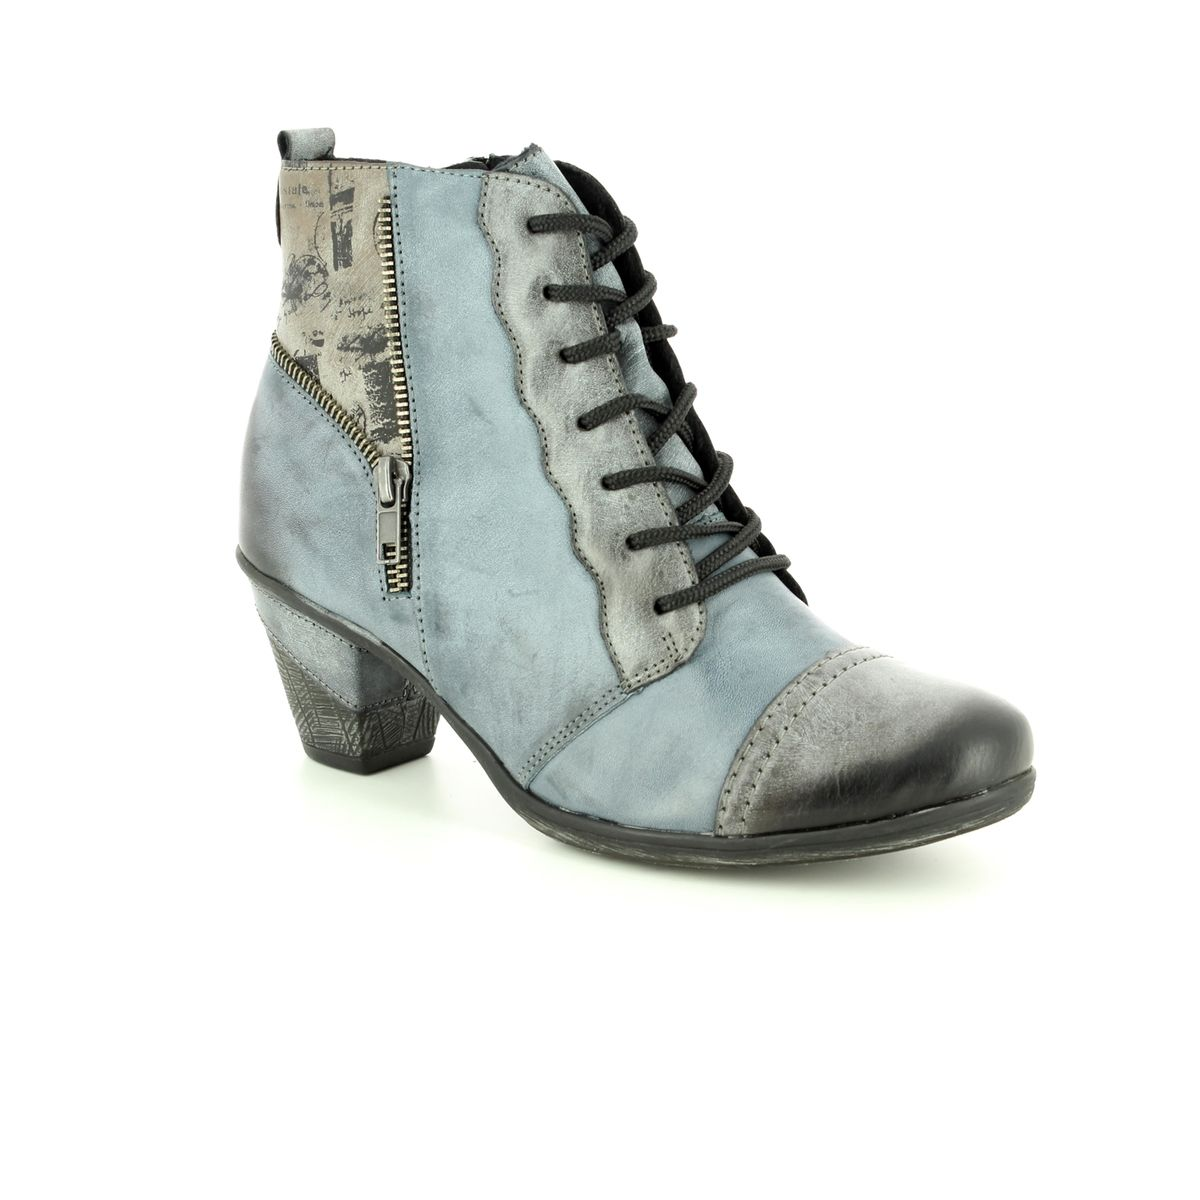 0a06683d0888a Remonte Ankle Boots - Black-Grey Multi - D8782-14 ANNITELA